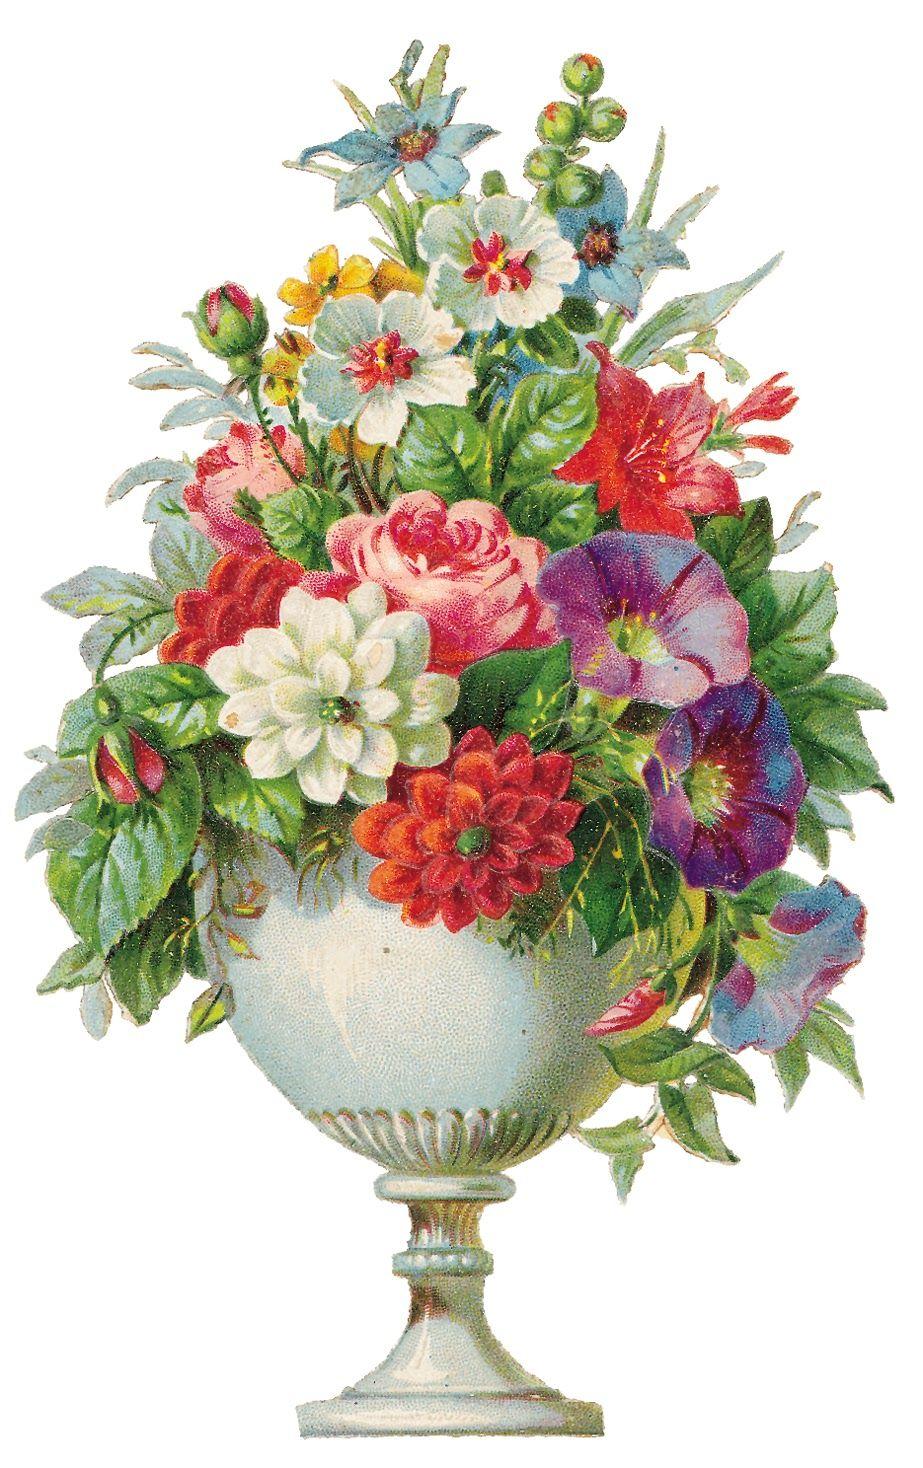 Vintage Flowers Clip Art Borders Vintagefeedsacks